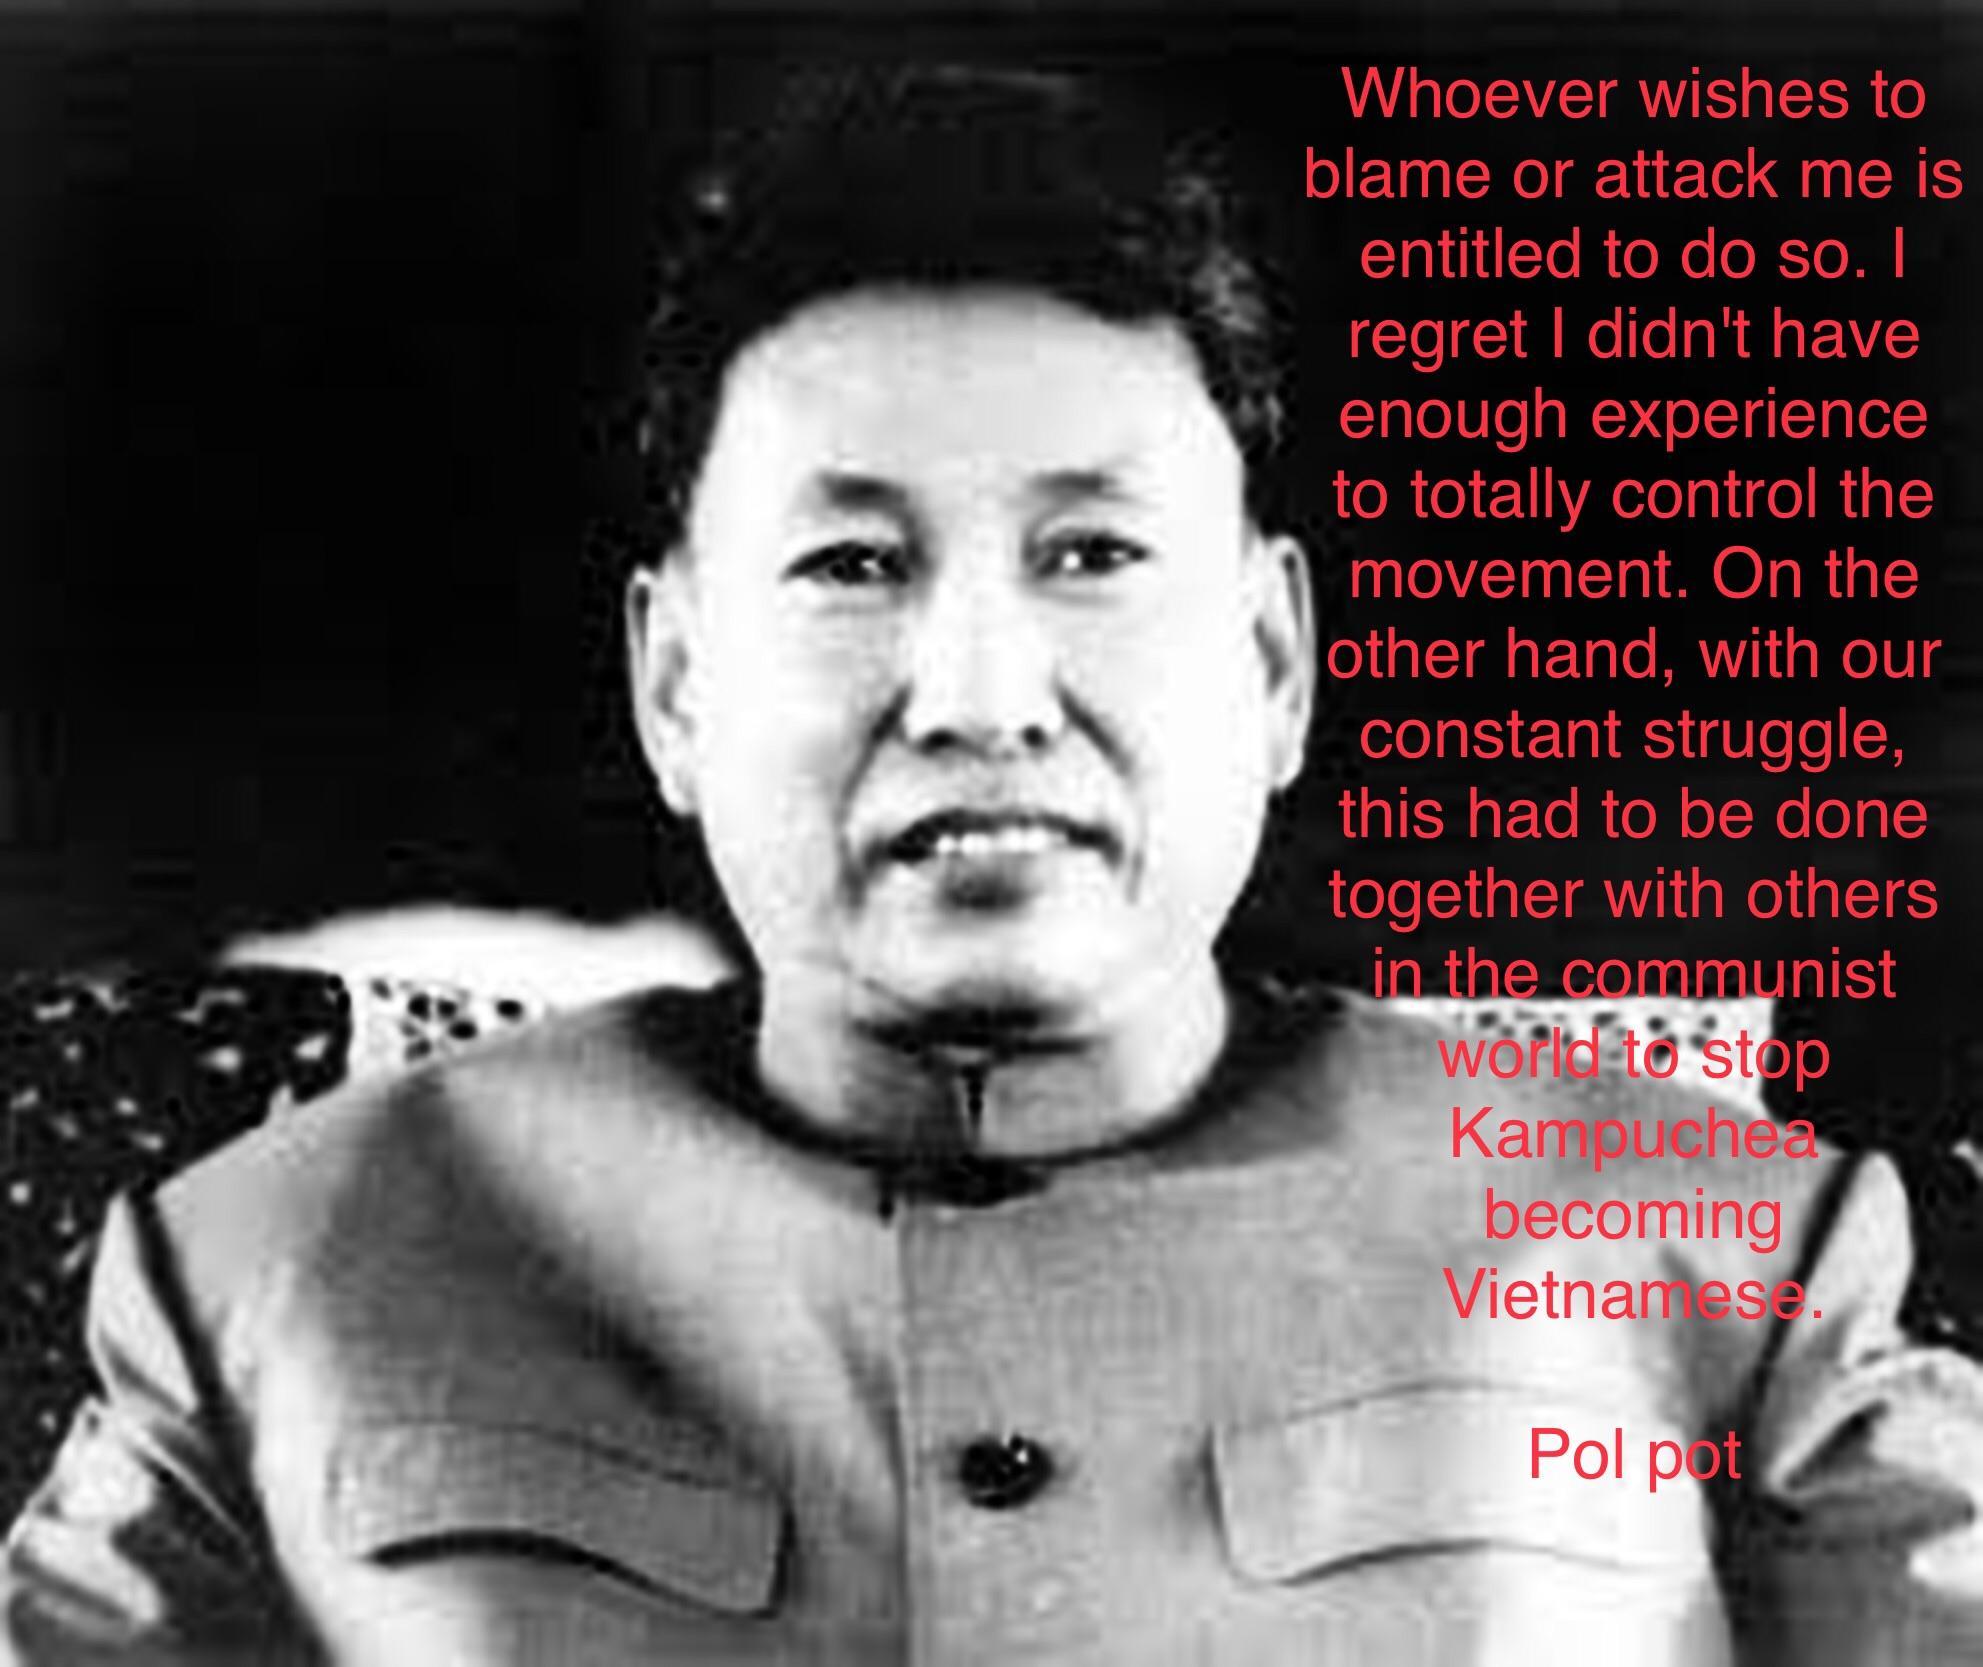 w'Ofltftb '7st Kampuch - . ' becoming Vietna Pol p. https://inspirational.ly